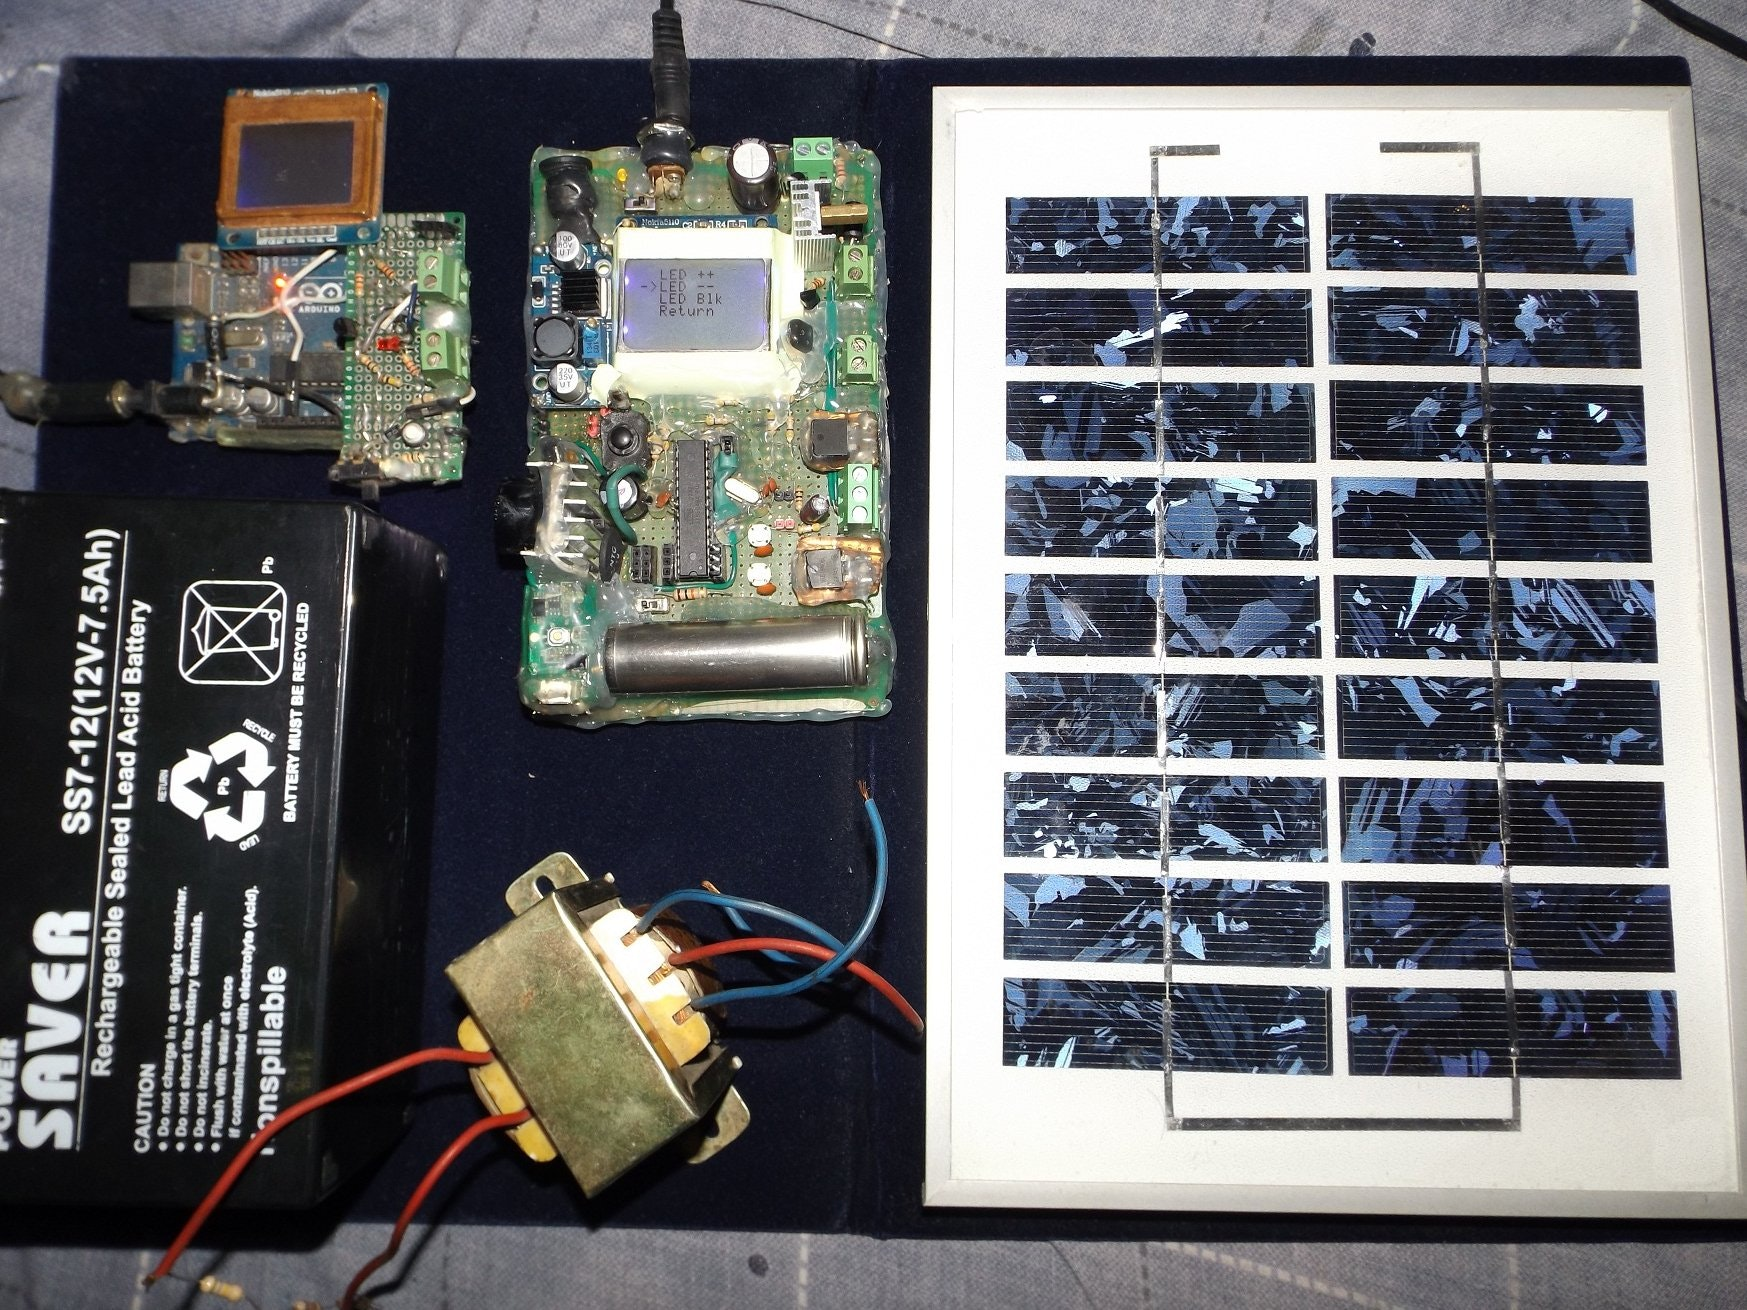 Mppt Solar Charge Controller Circuit Diagram Polaris Ranger 500 Using Microcontroller Working Integrated Chargecontroller Inverter Powerbank Lamp Wiring